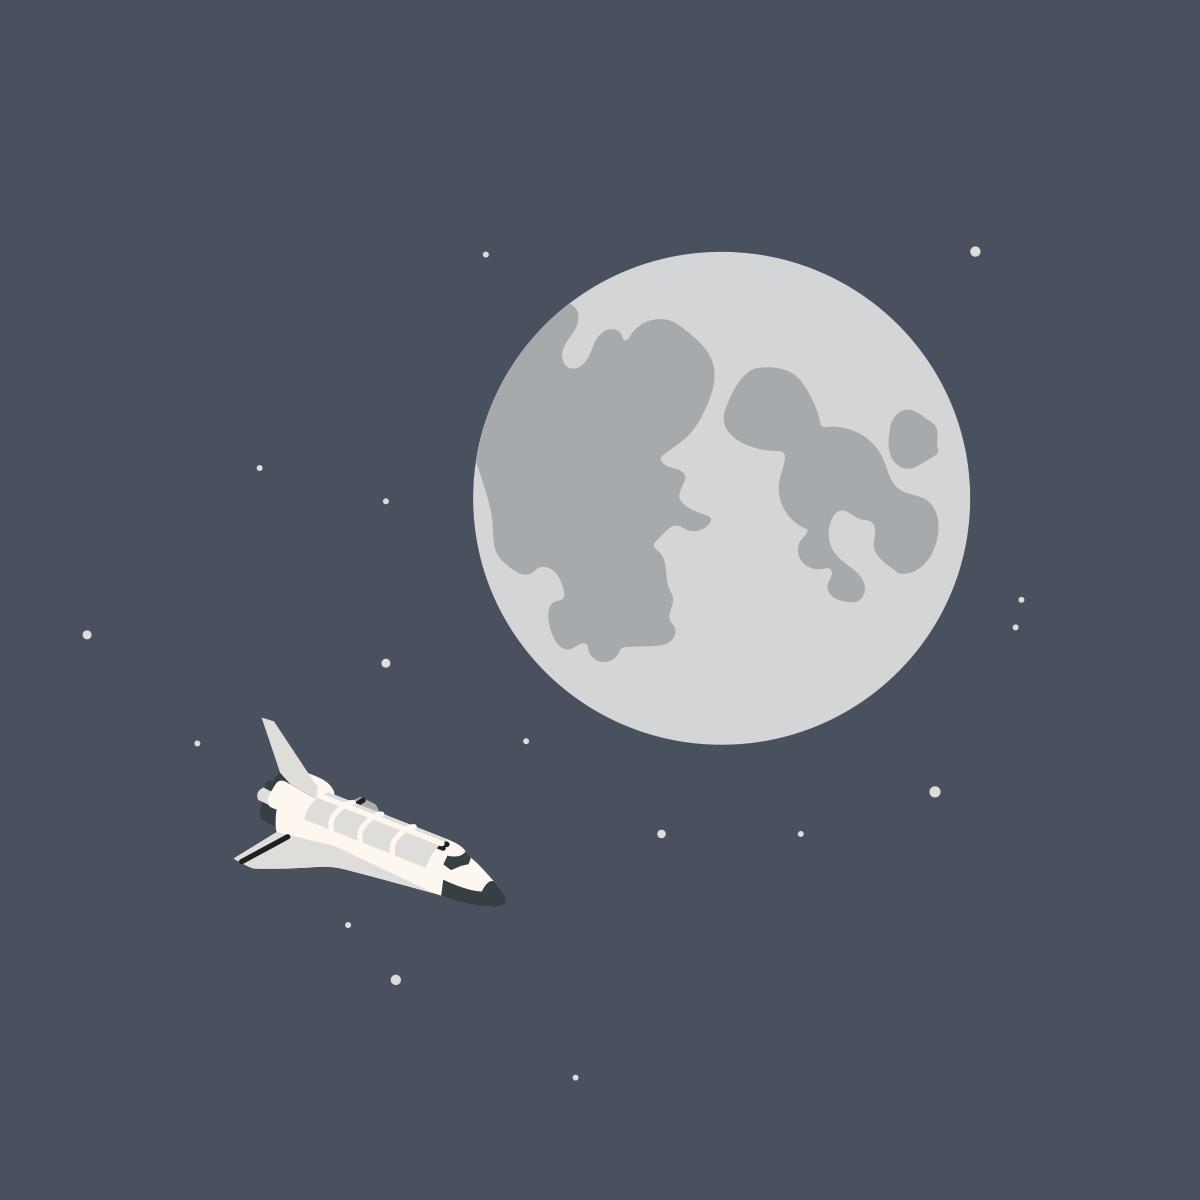 72 new moon race